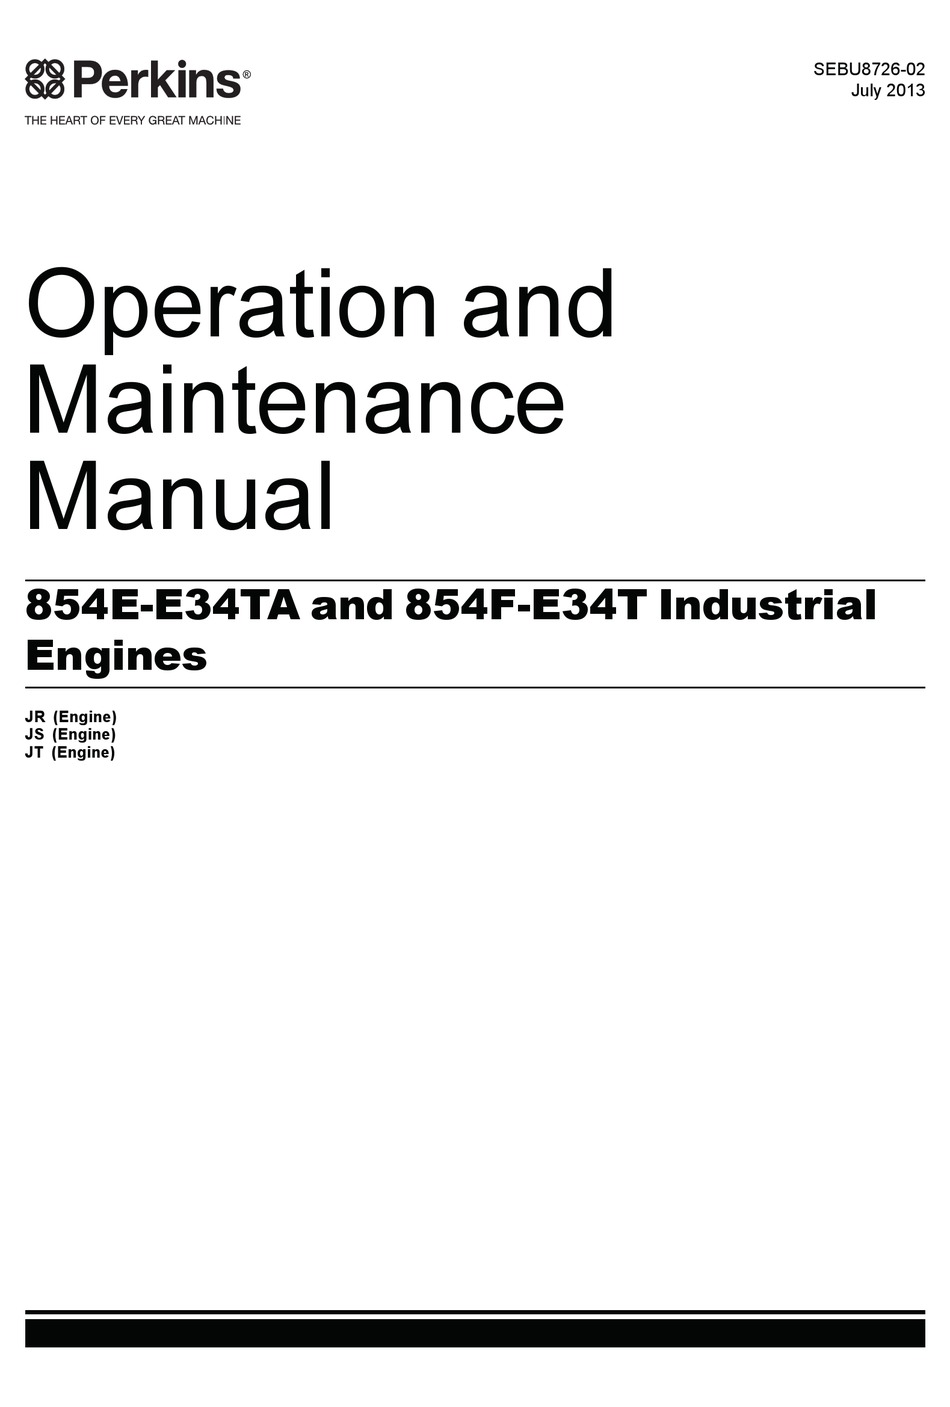 PERKINS 854E-E34TA OPERATION AND MAINTENANCE MANUAL Pdf